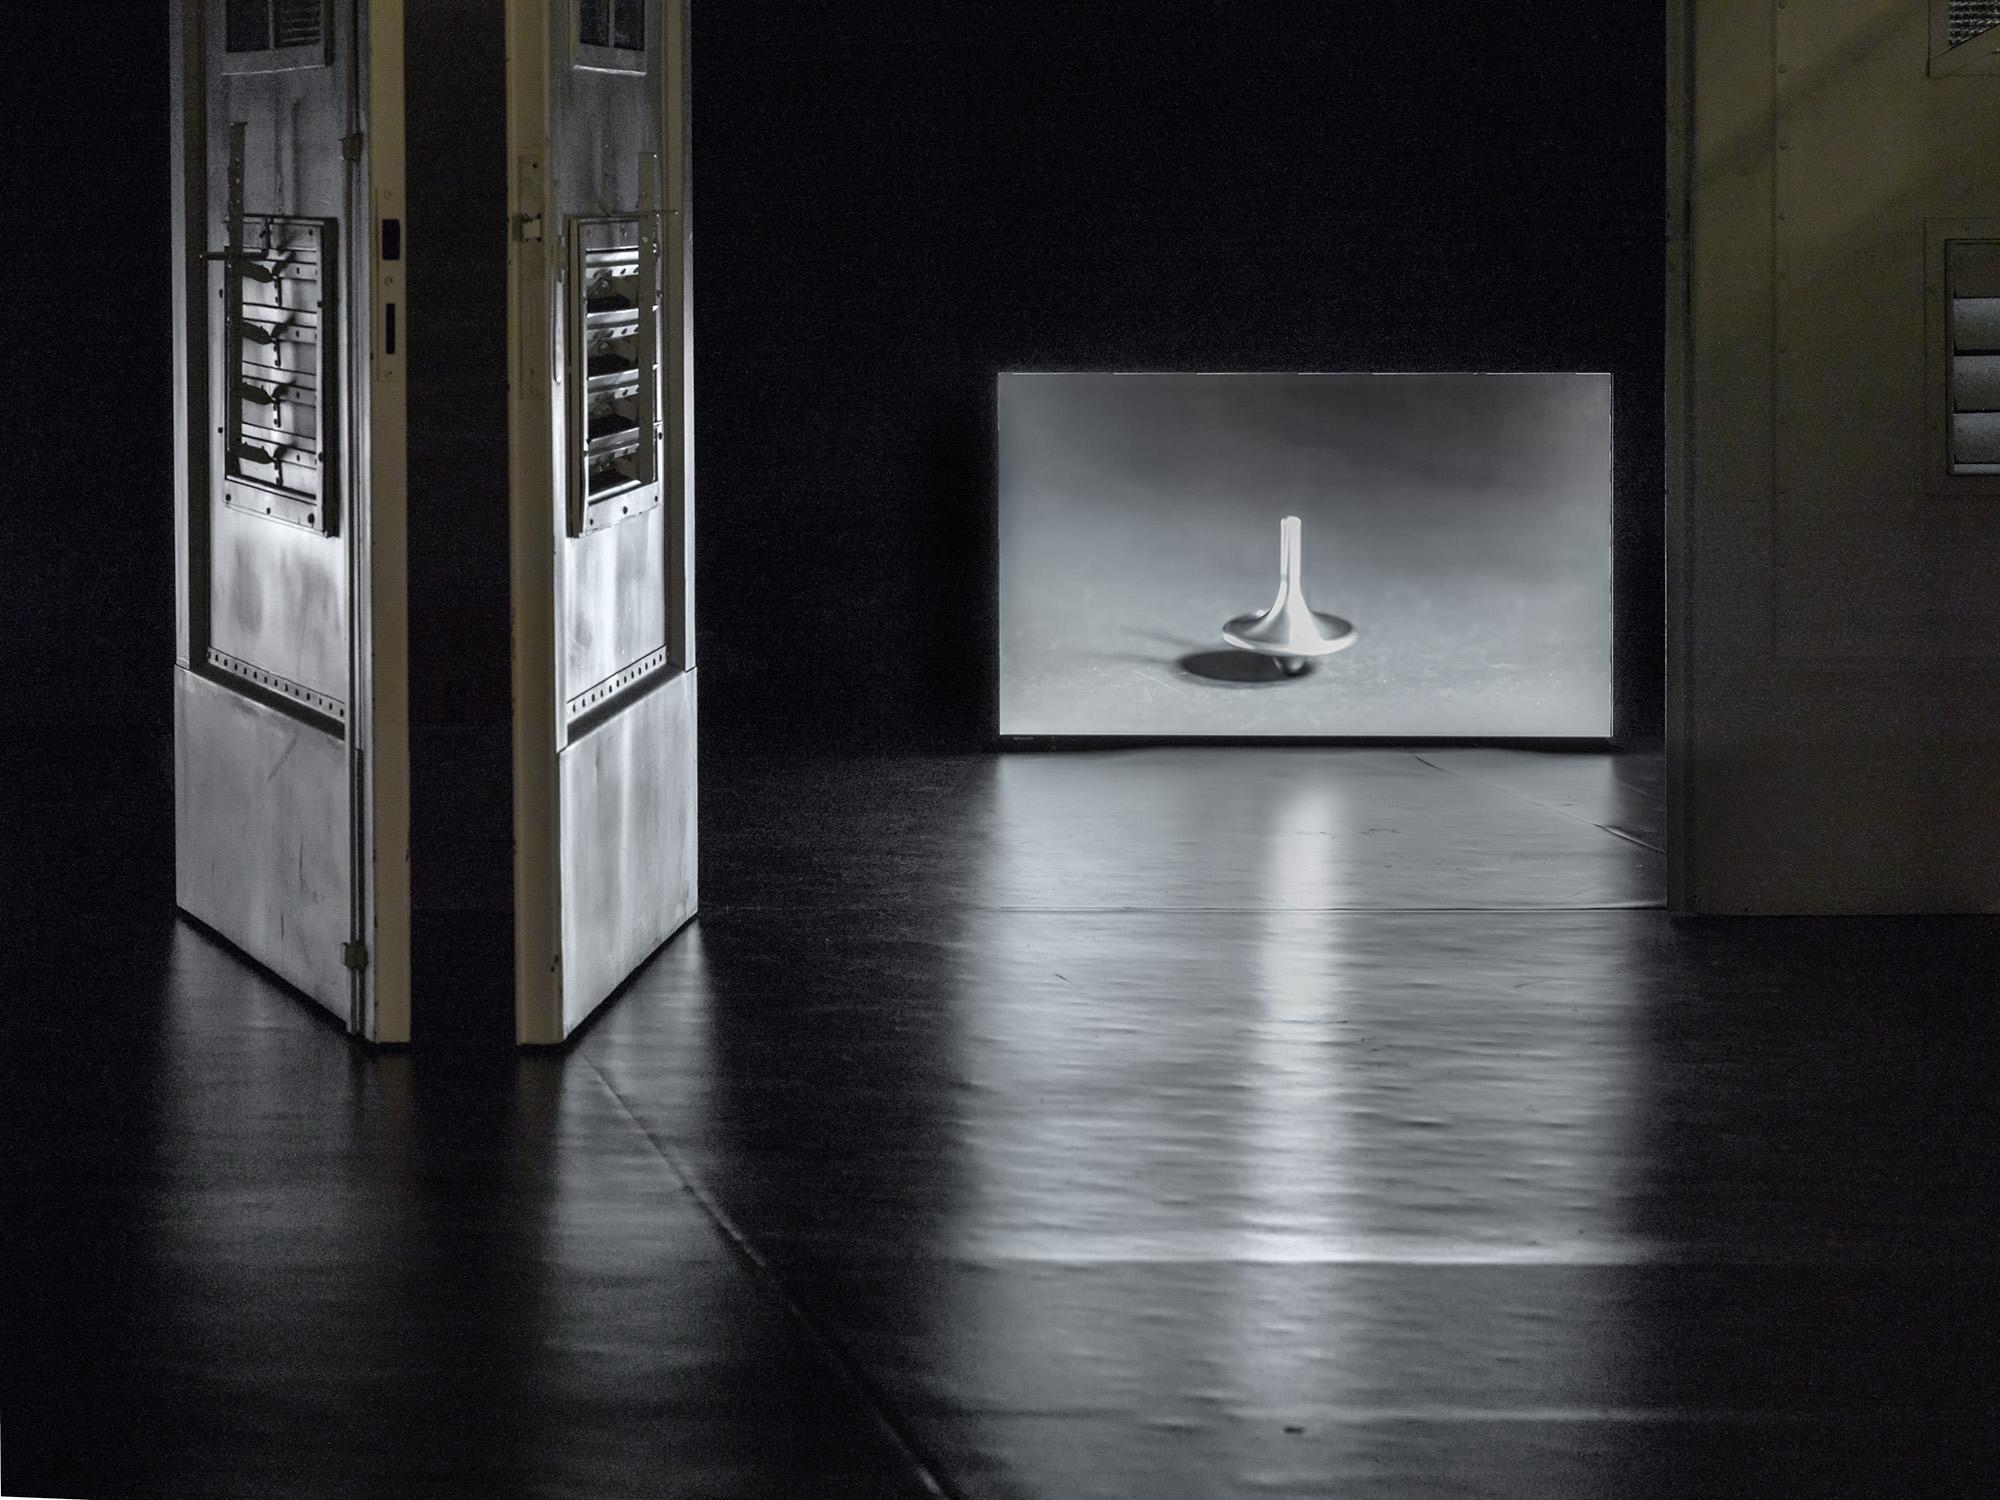 Alicja Kwade, Kreisel (Inception), 2012, fot.Kamil Macioł